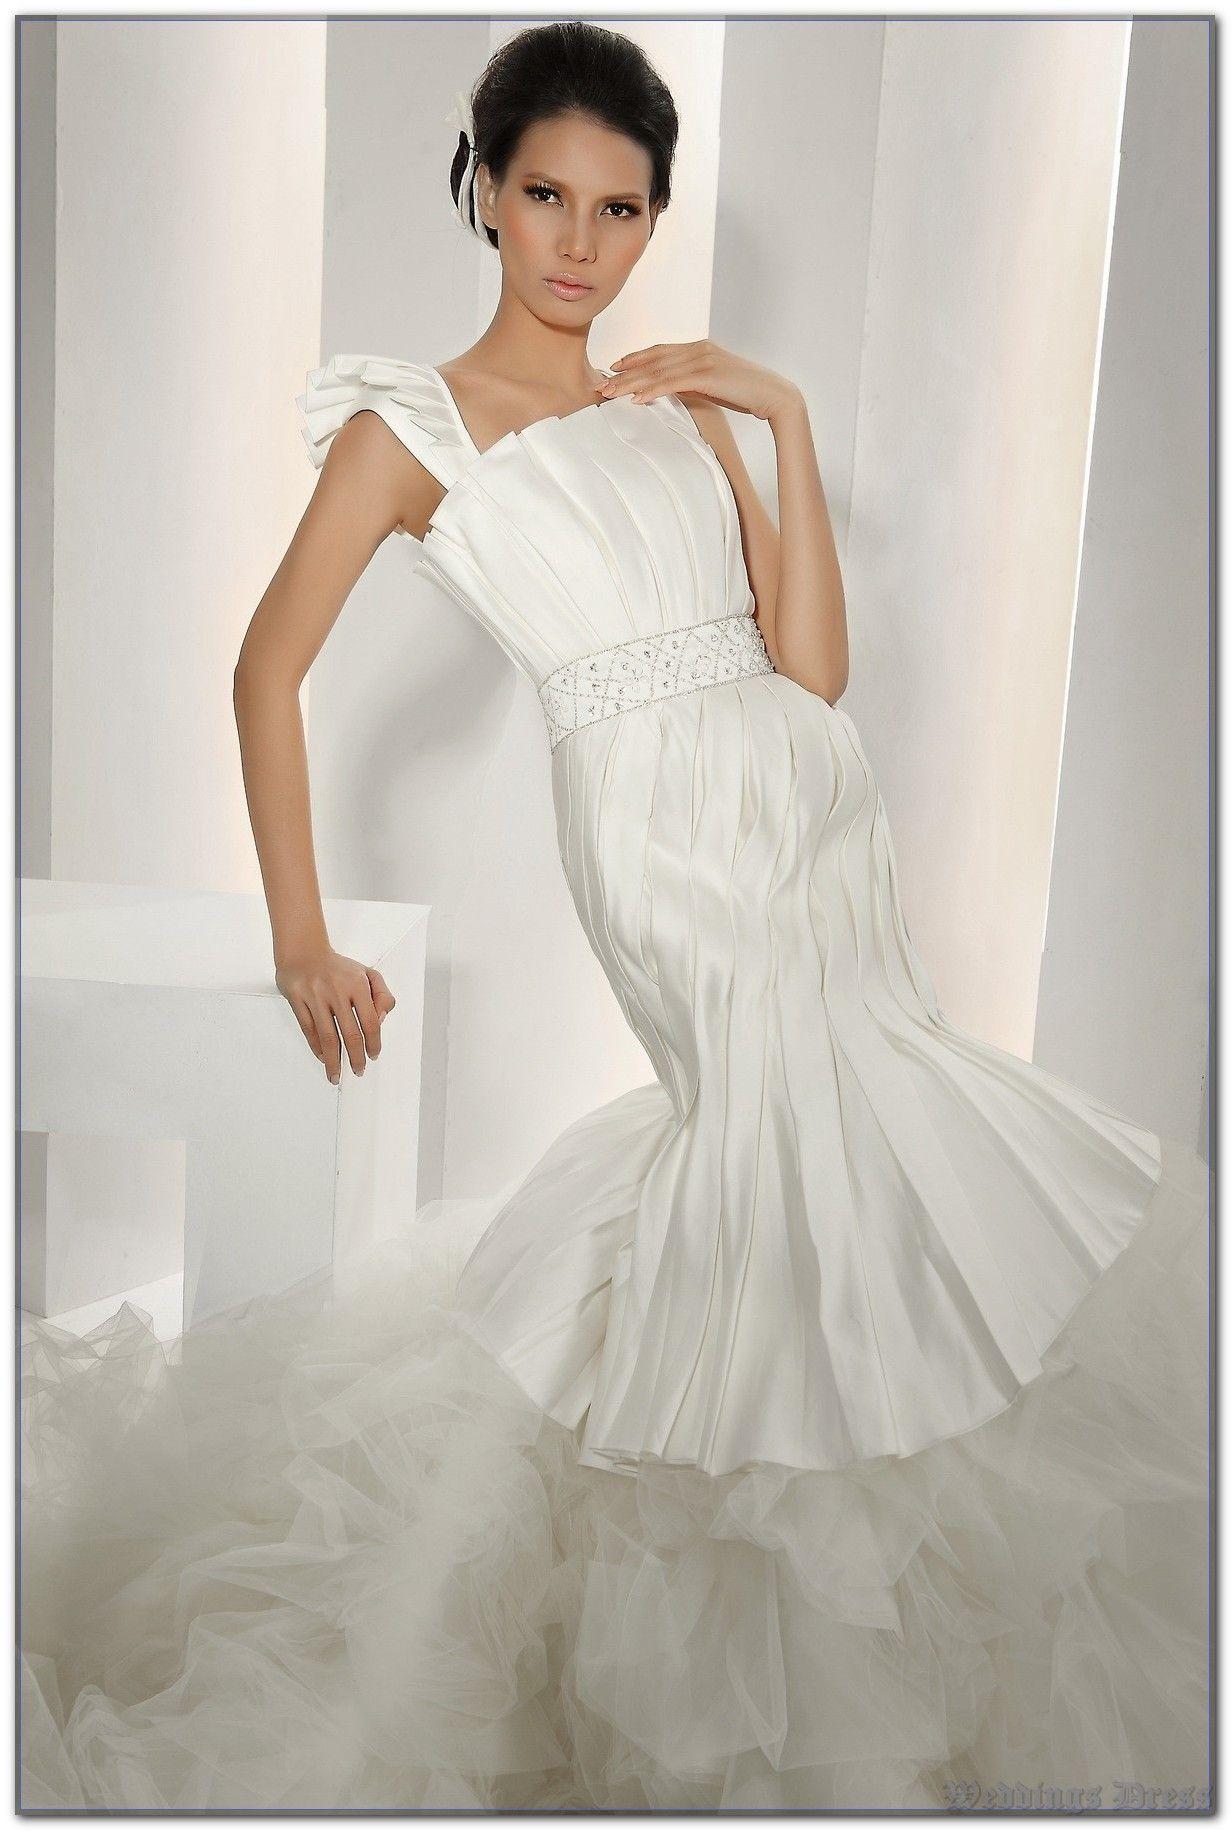 Little Known Ways to Weddings Dress